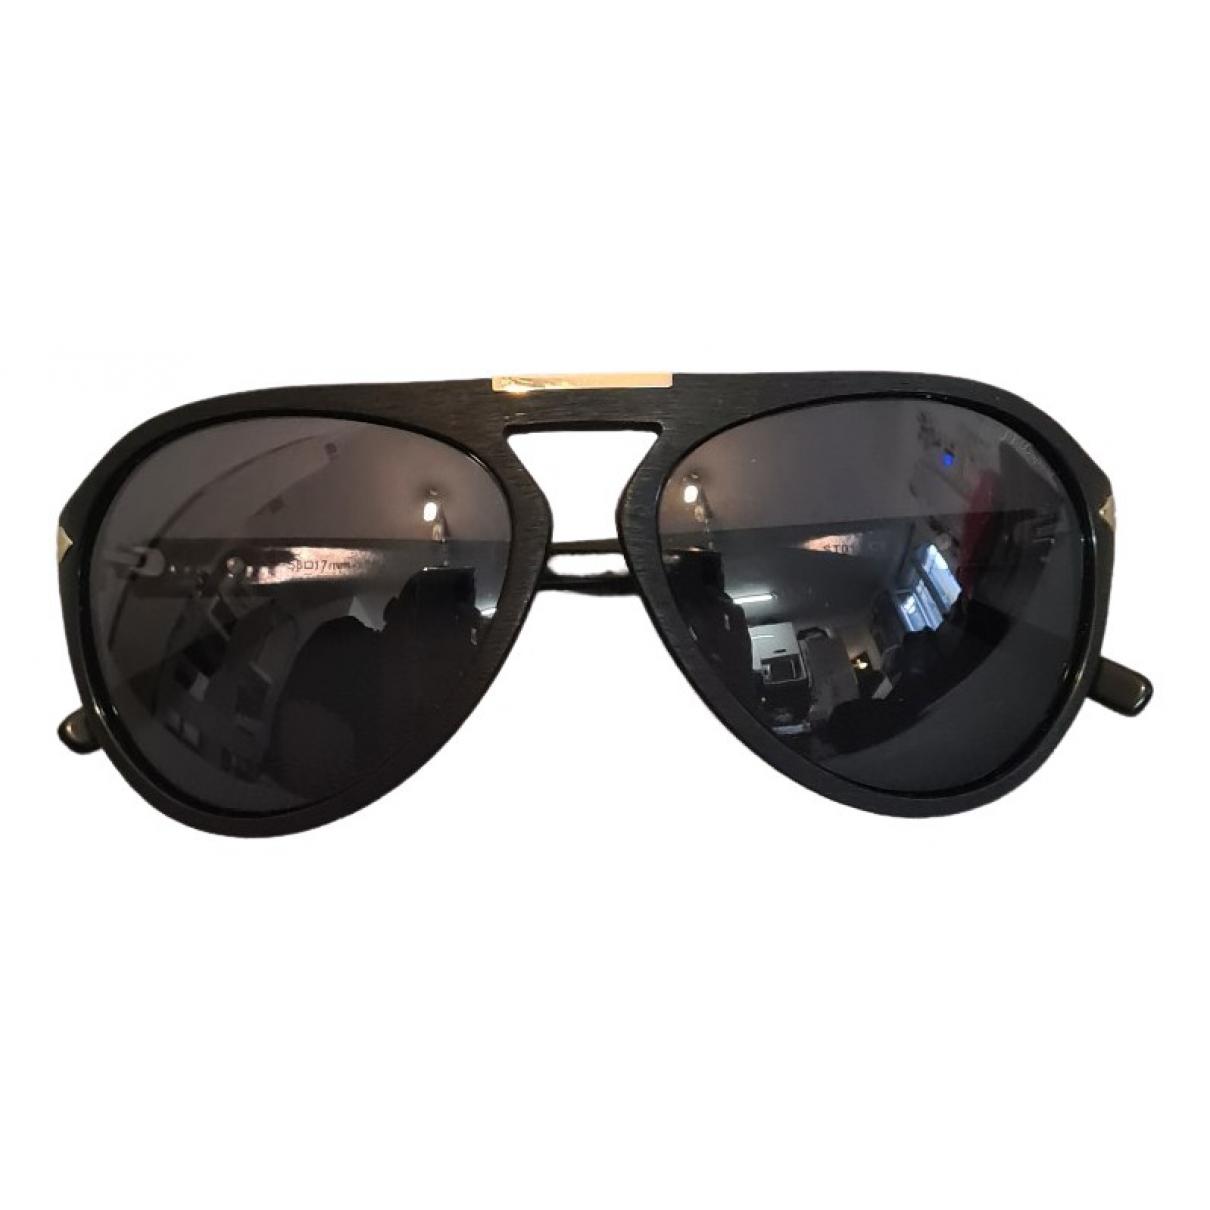 Gafas S.t. Dupont